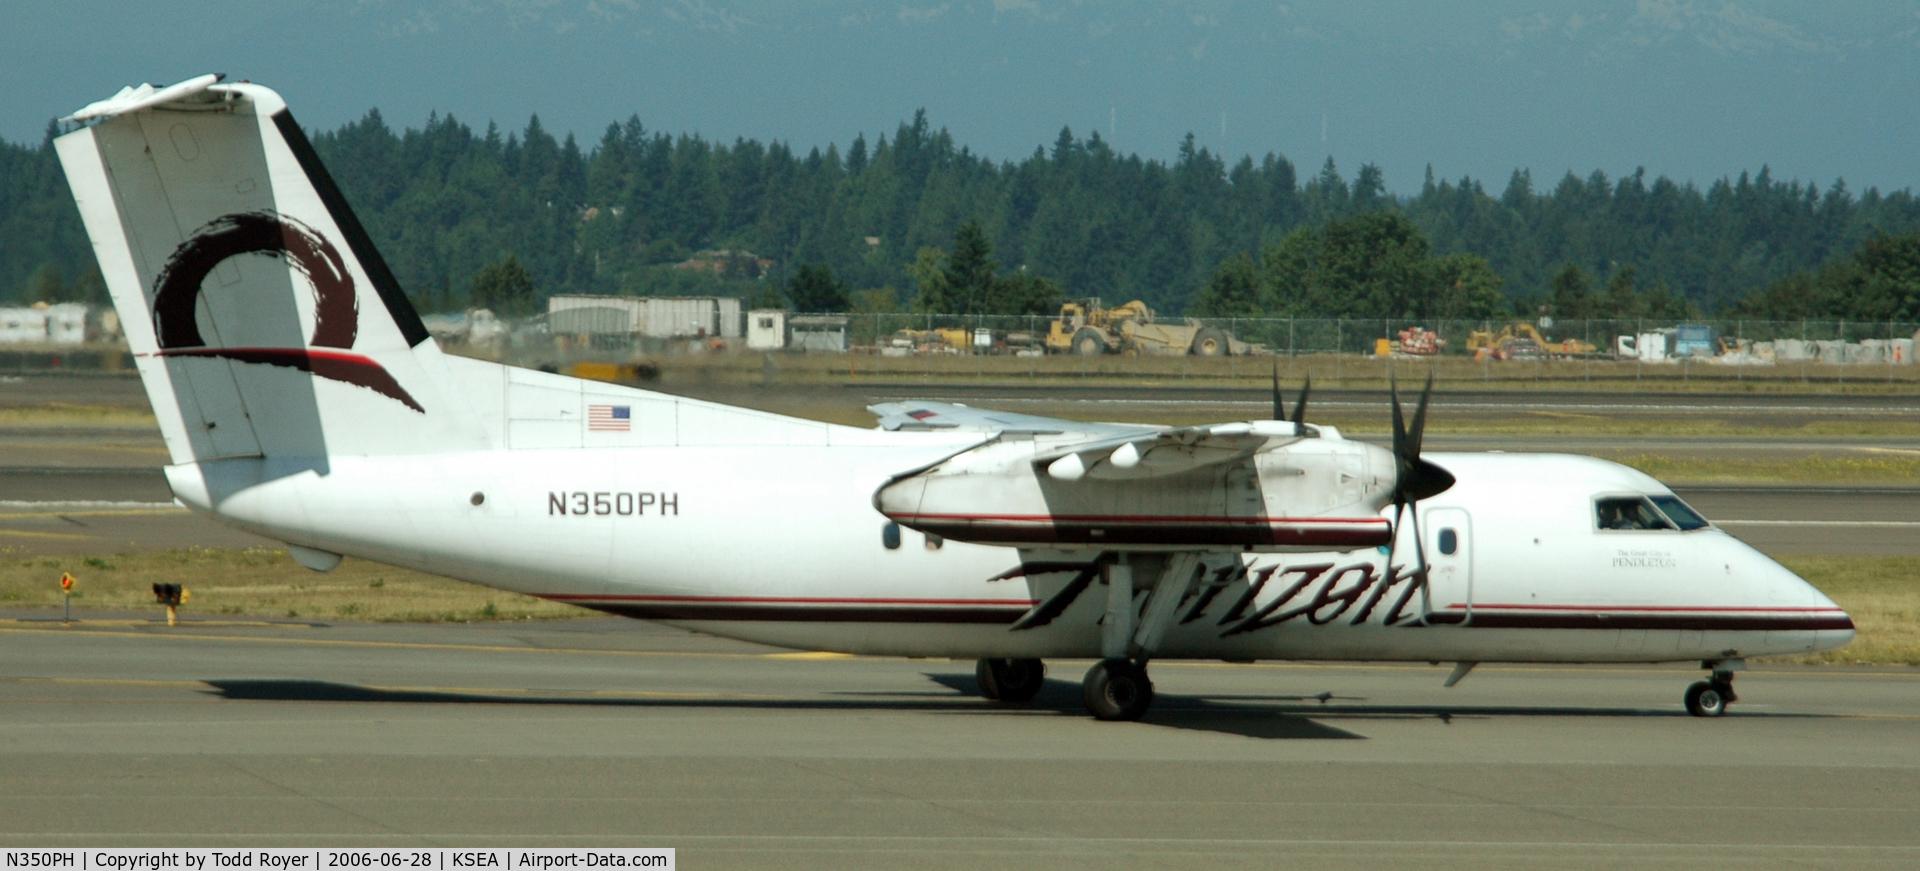 N350PH, 1997 De Havilland Canada DHC-8-202 Dash 8 C/N 488, Taxi for departure